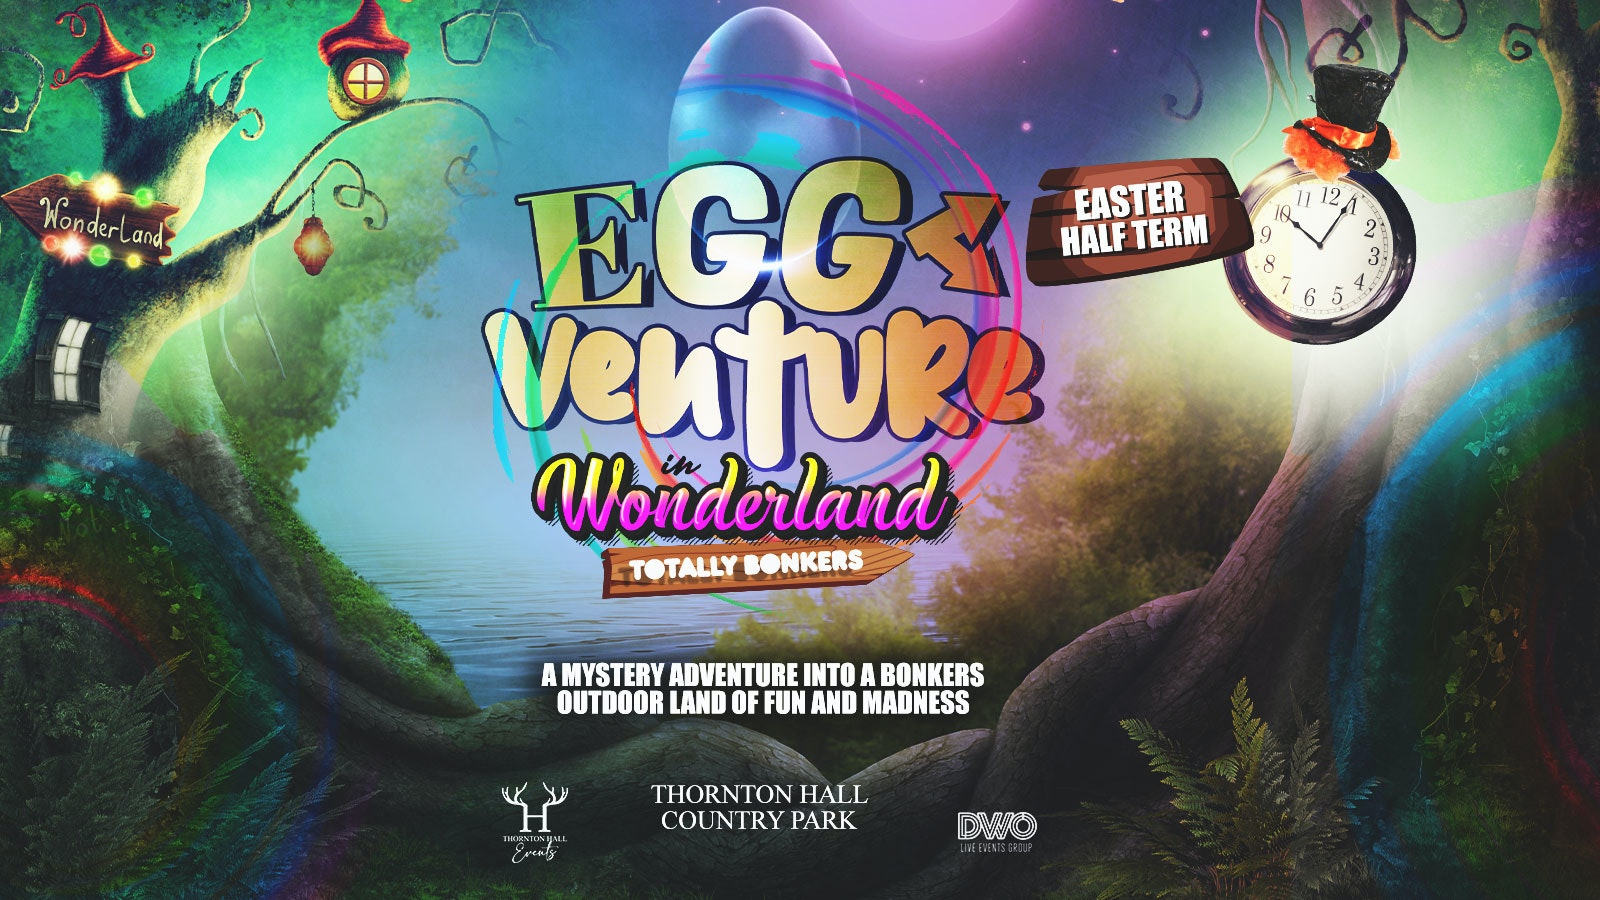 EggVenture in Wonderland – Thursday 8th April – 10.30am